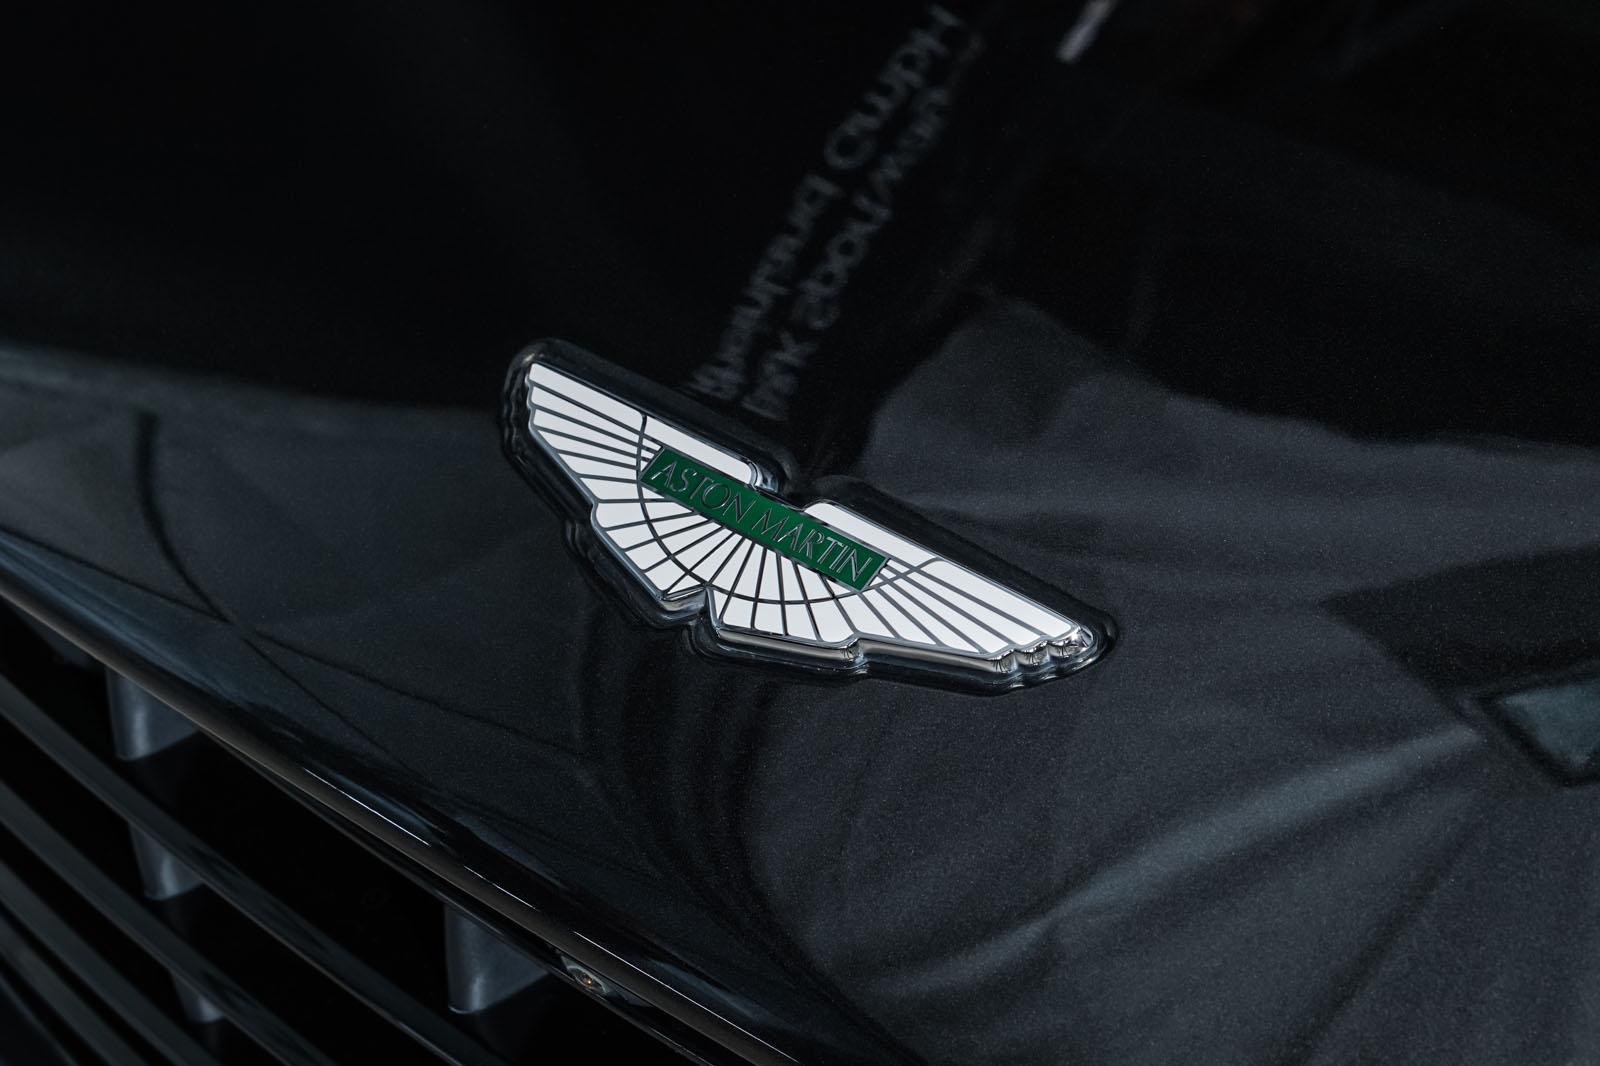 Aston-Martin_DB11_CeramicBlack_Black_AM-1916_14_w